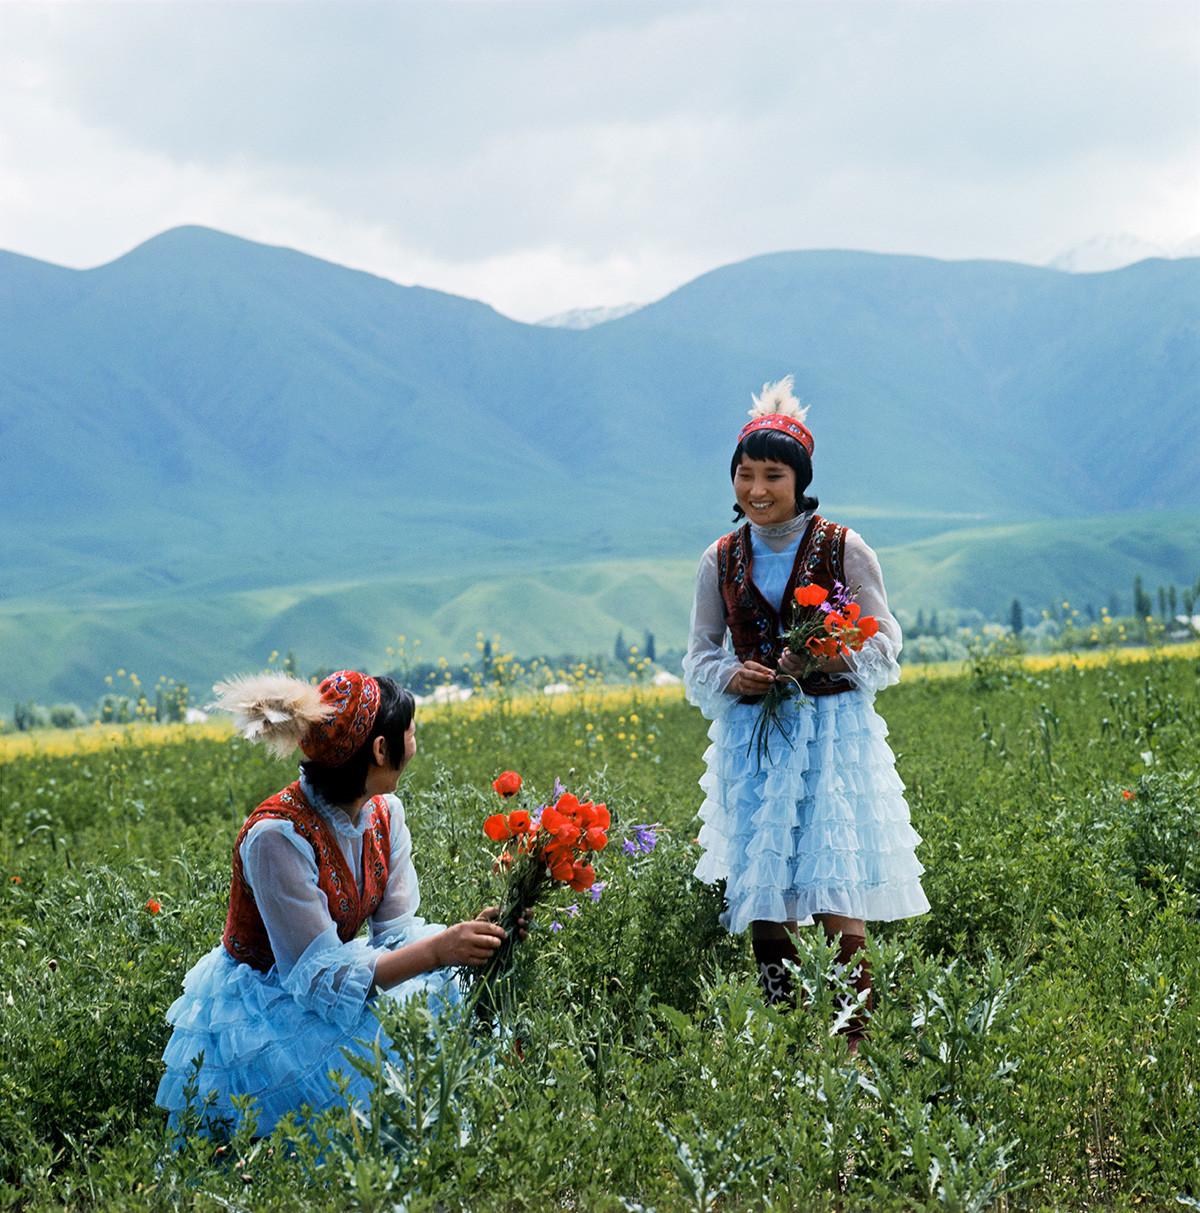 Kirgisische SSR. Kirgisische Mädchen in nationaler Kleidung.